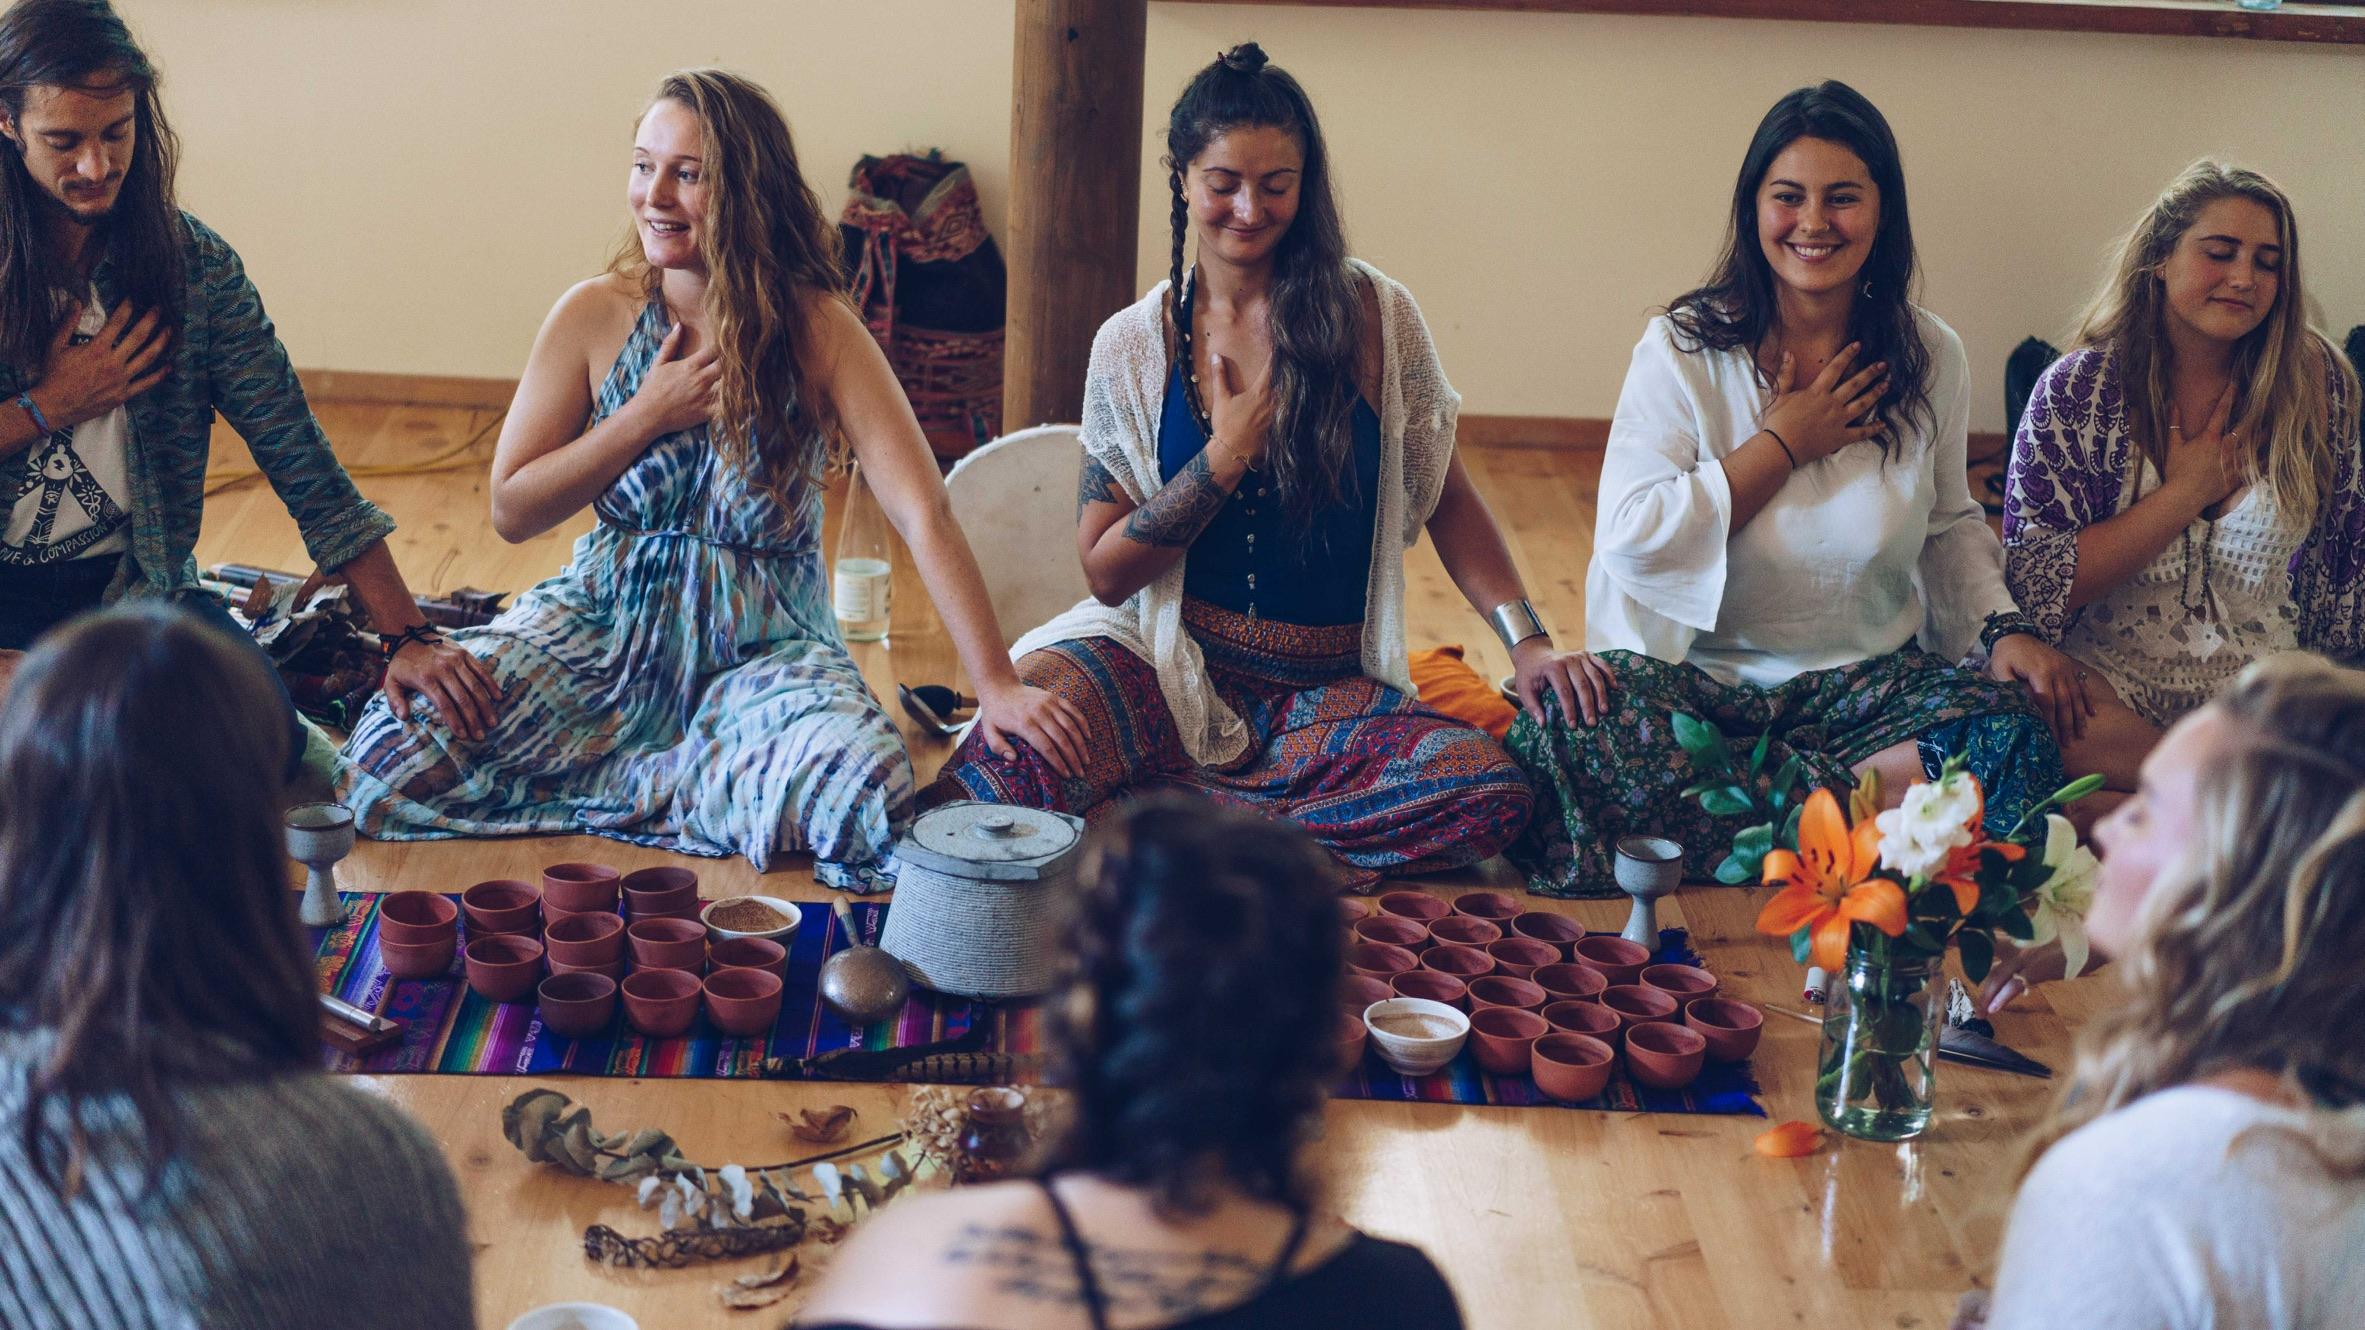 Photo courtesy  Little Yoga Festival